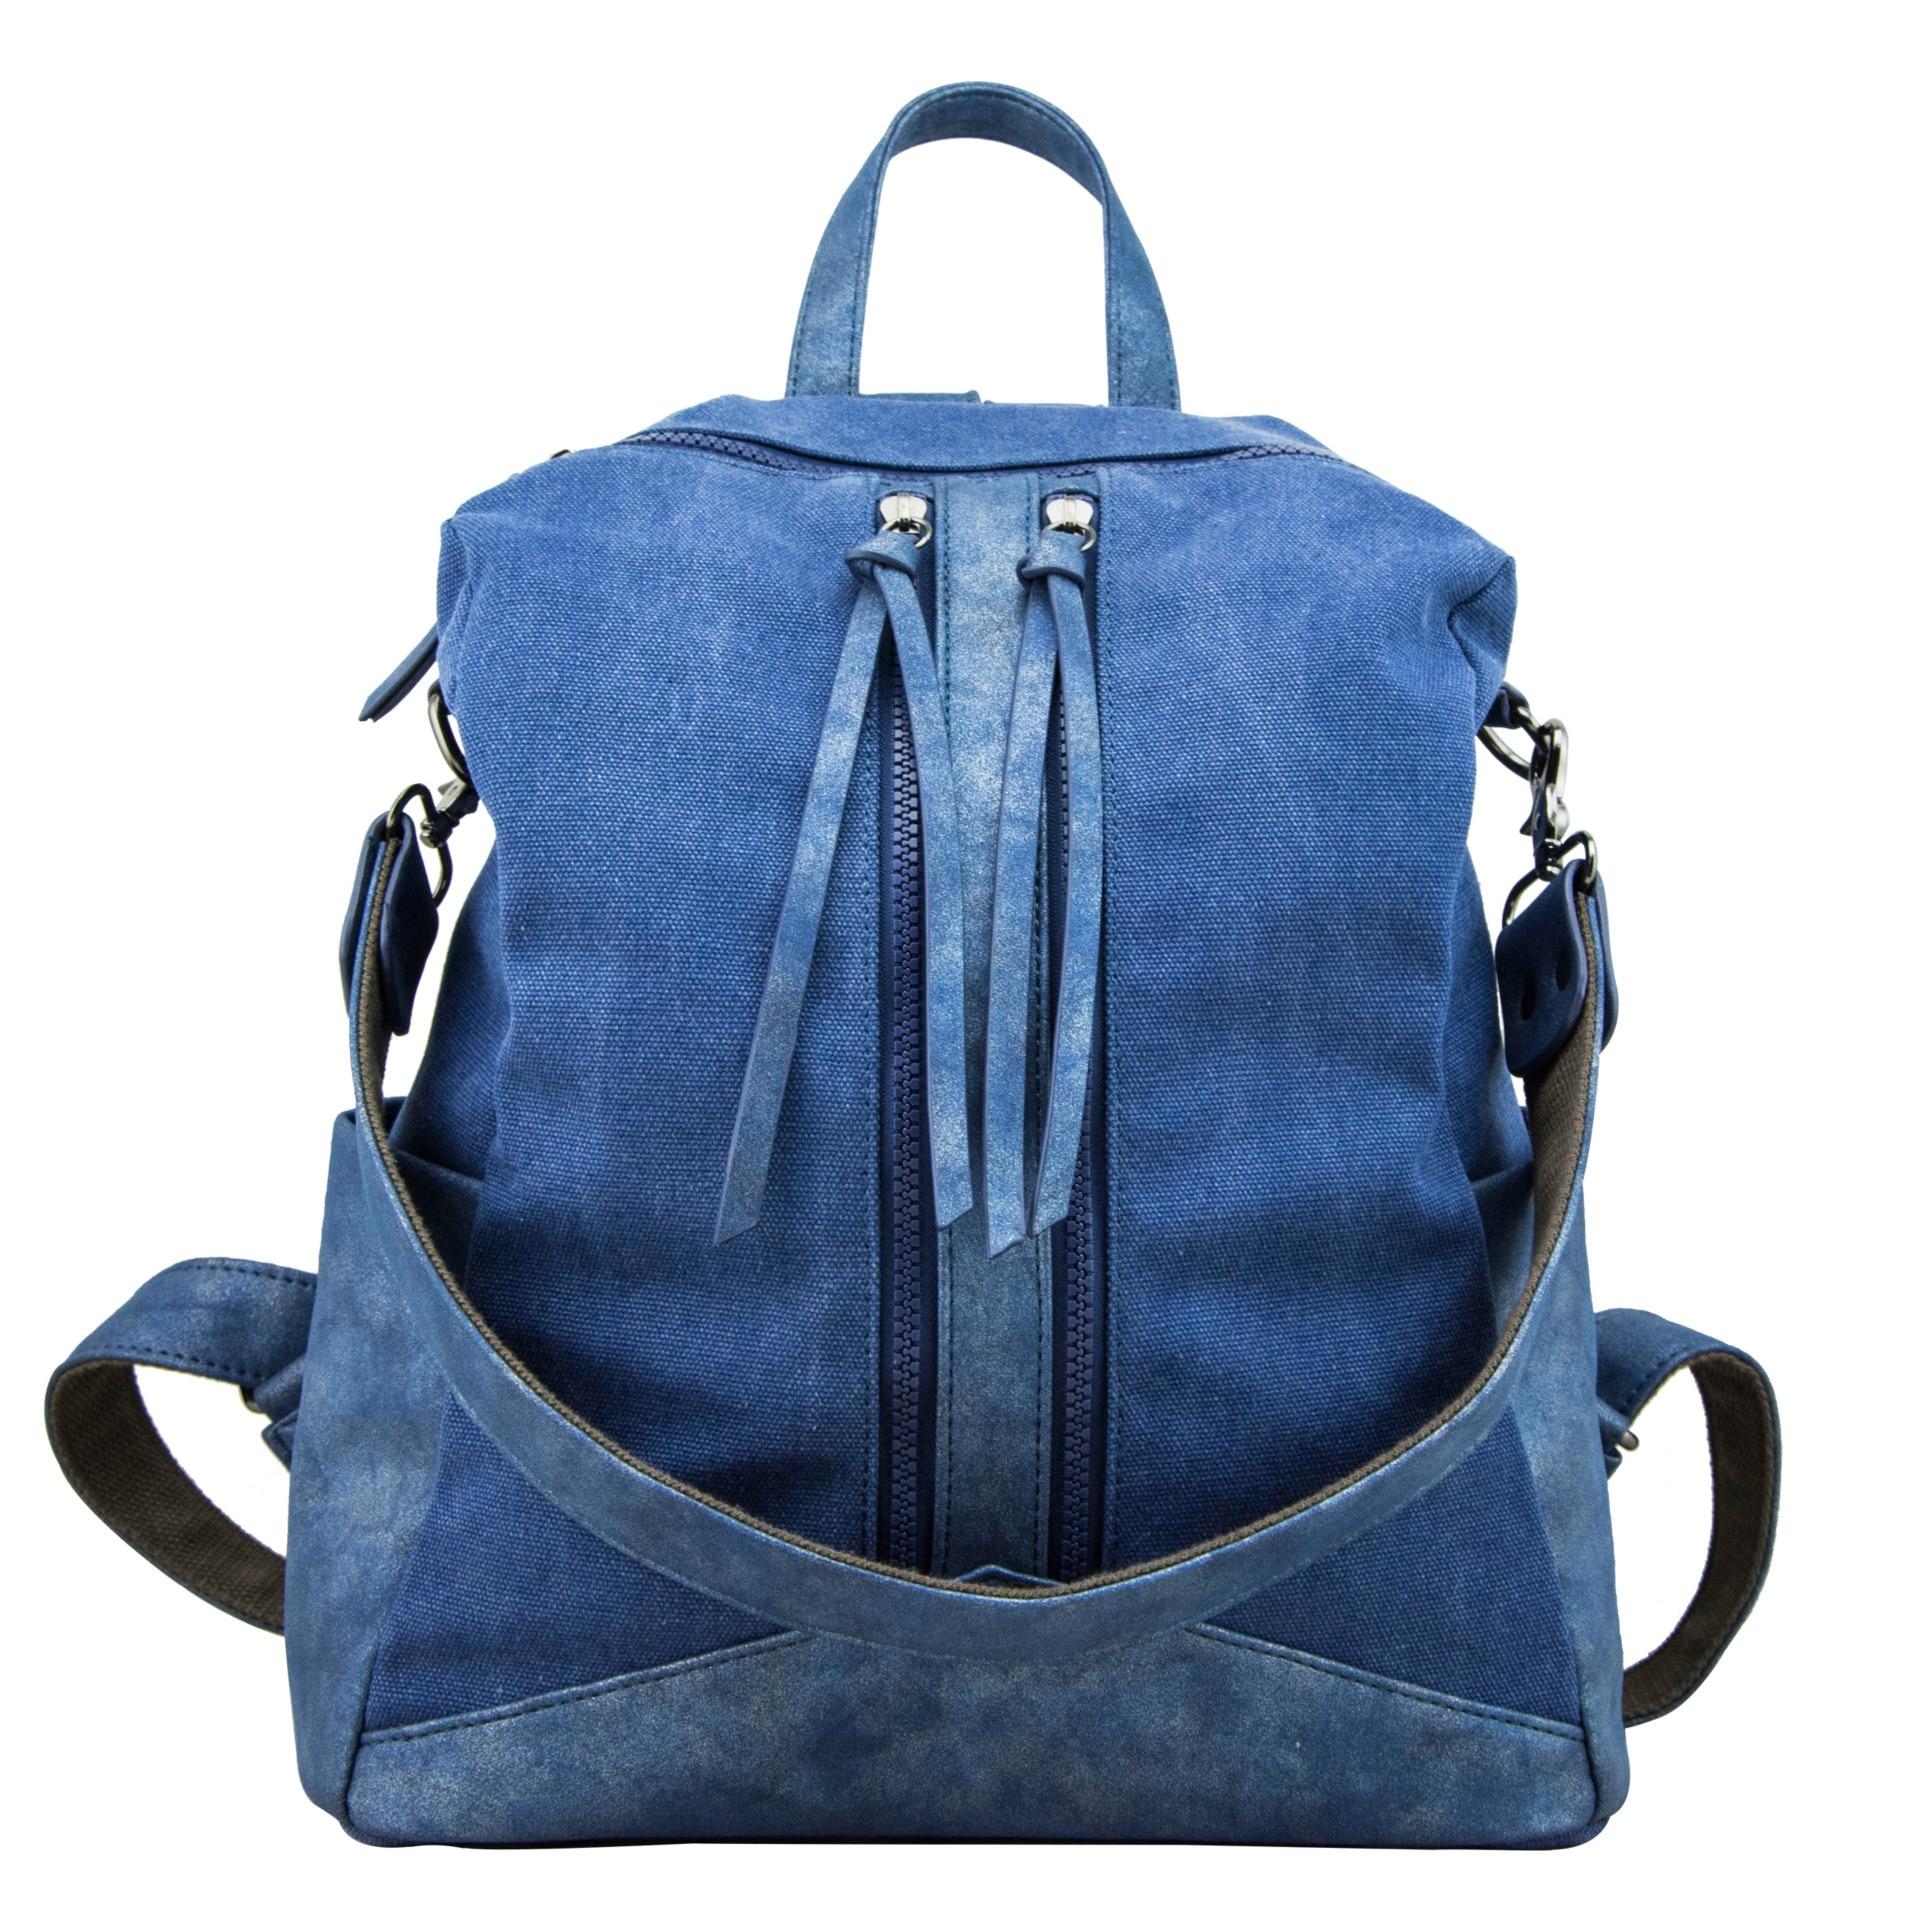 Women Canvas Backpacks for Teenage Girls Shoulder Bag Drawstring Backpack Jeans for Teenage New Solid School Rucksacks Dual Use<br>